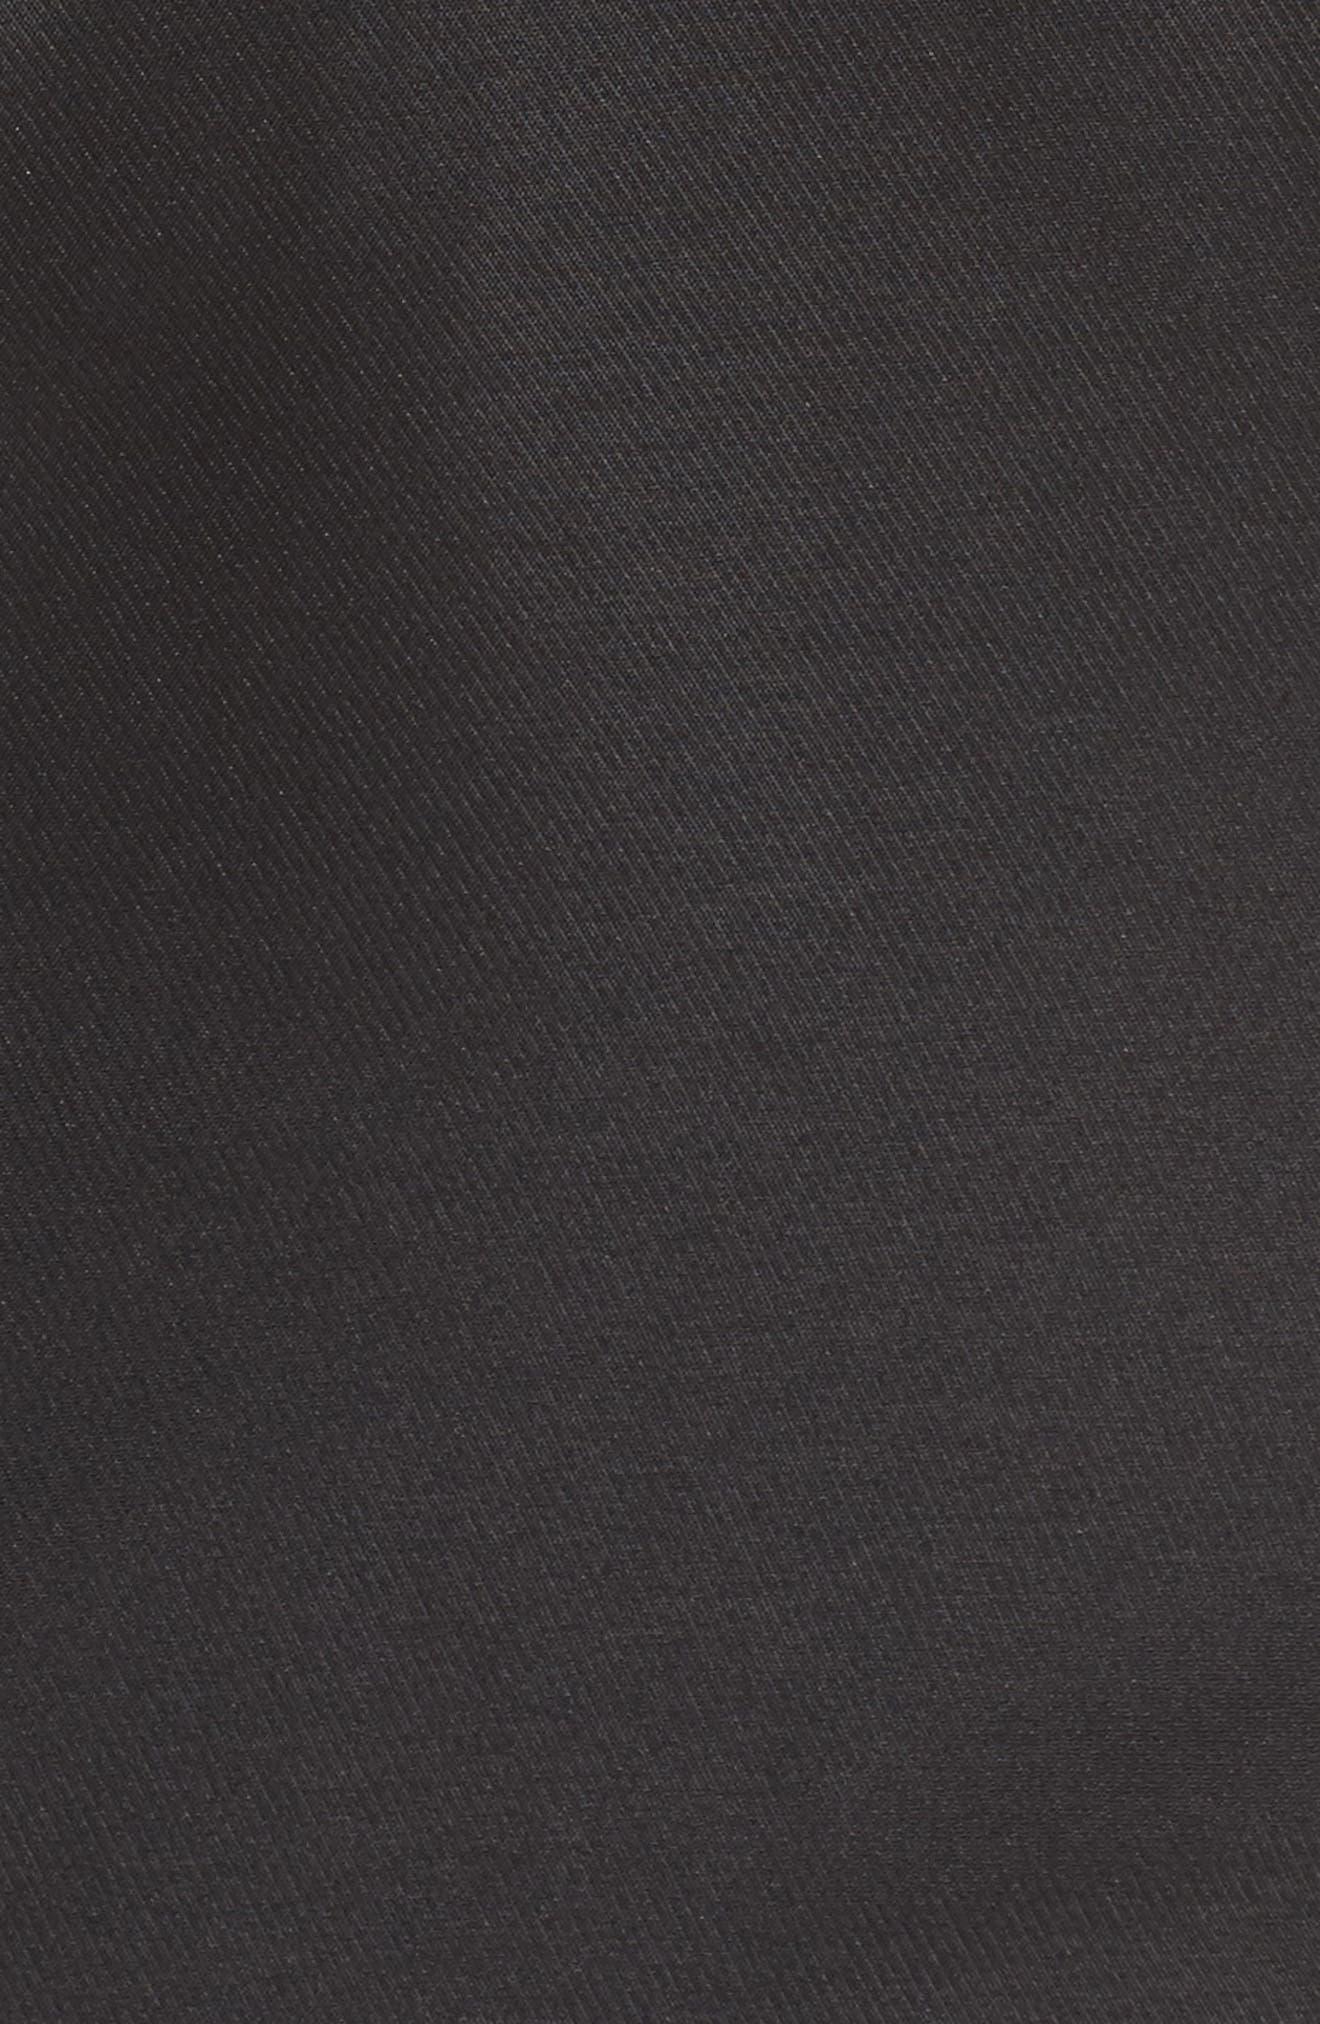 Be My Baby Halter Sheath Dress,                             Alternate thumbnail 6, color,                             BLACK